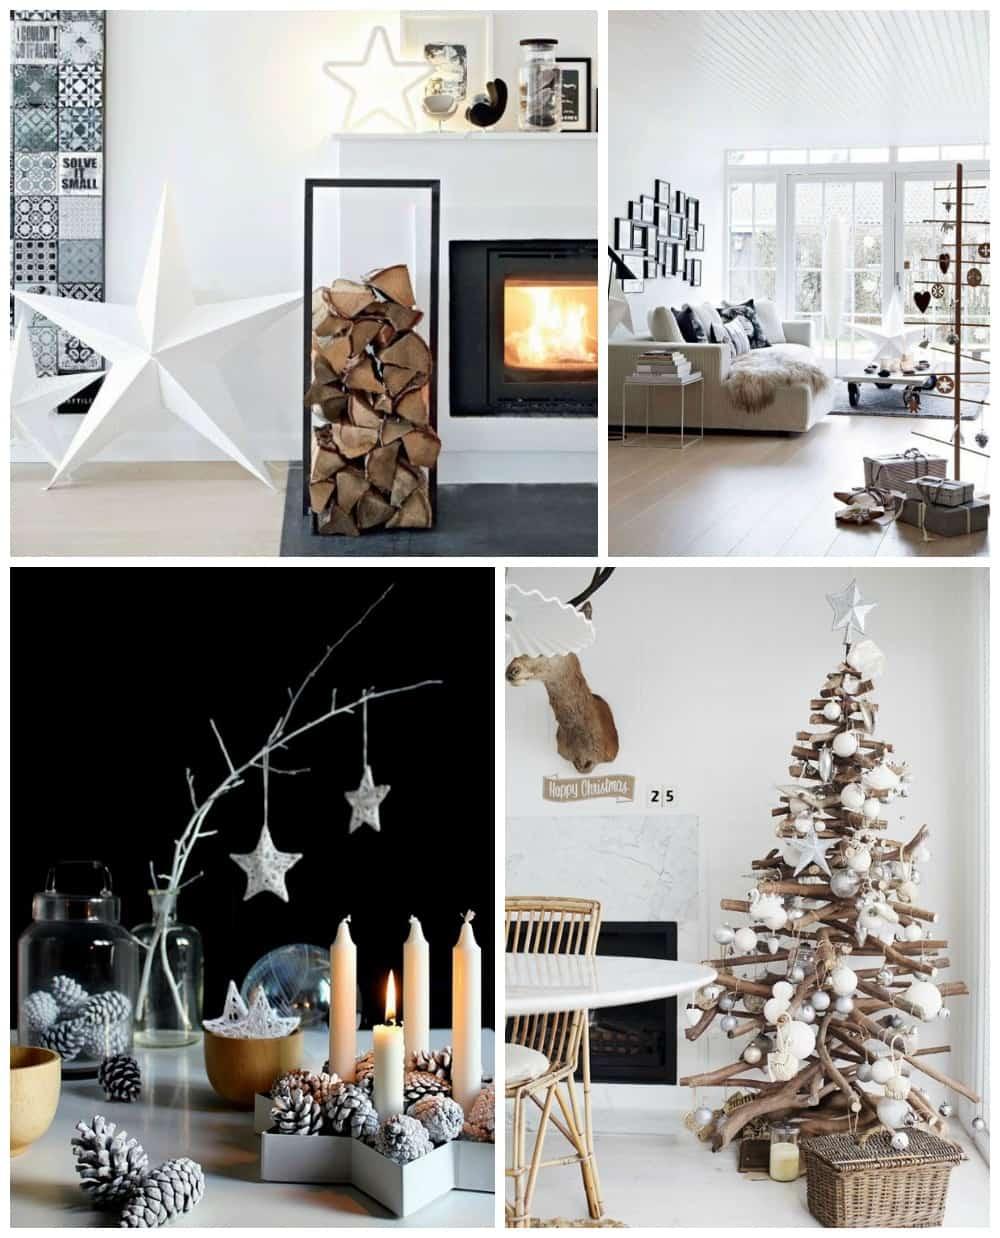 arredo scandinavo per natale 2015 trend tendenza natalizio